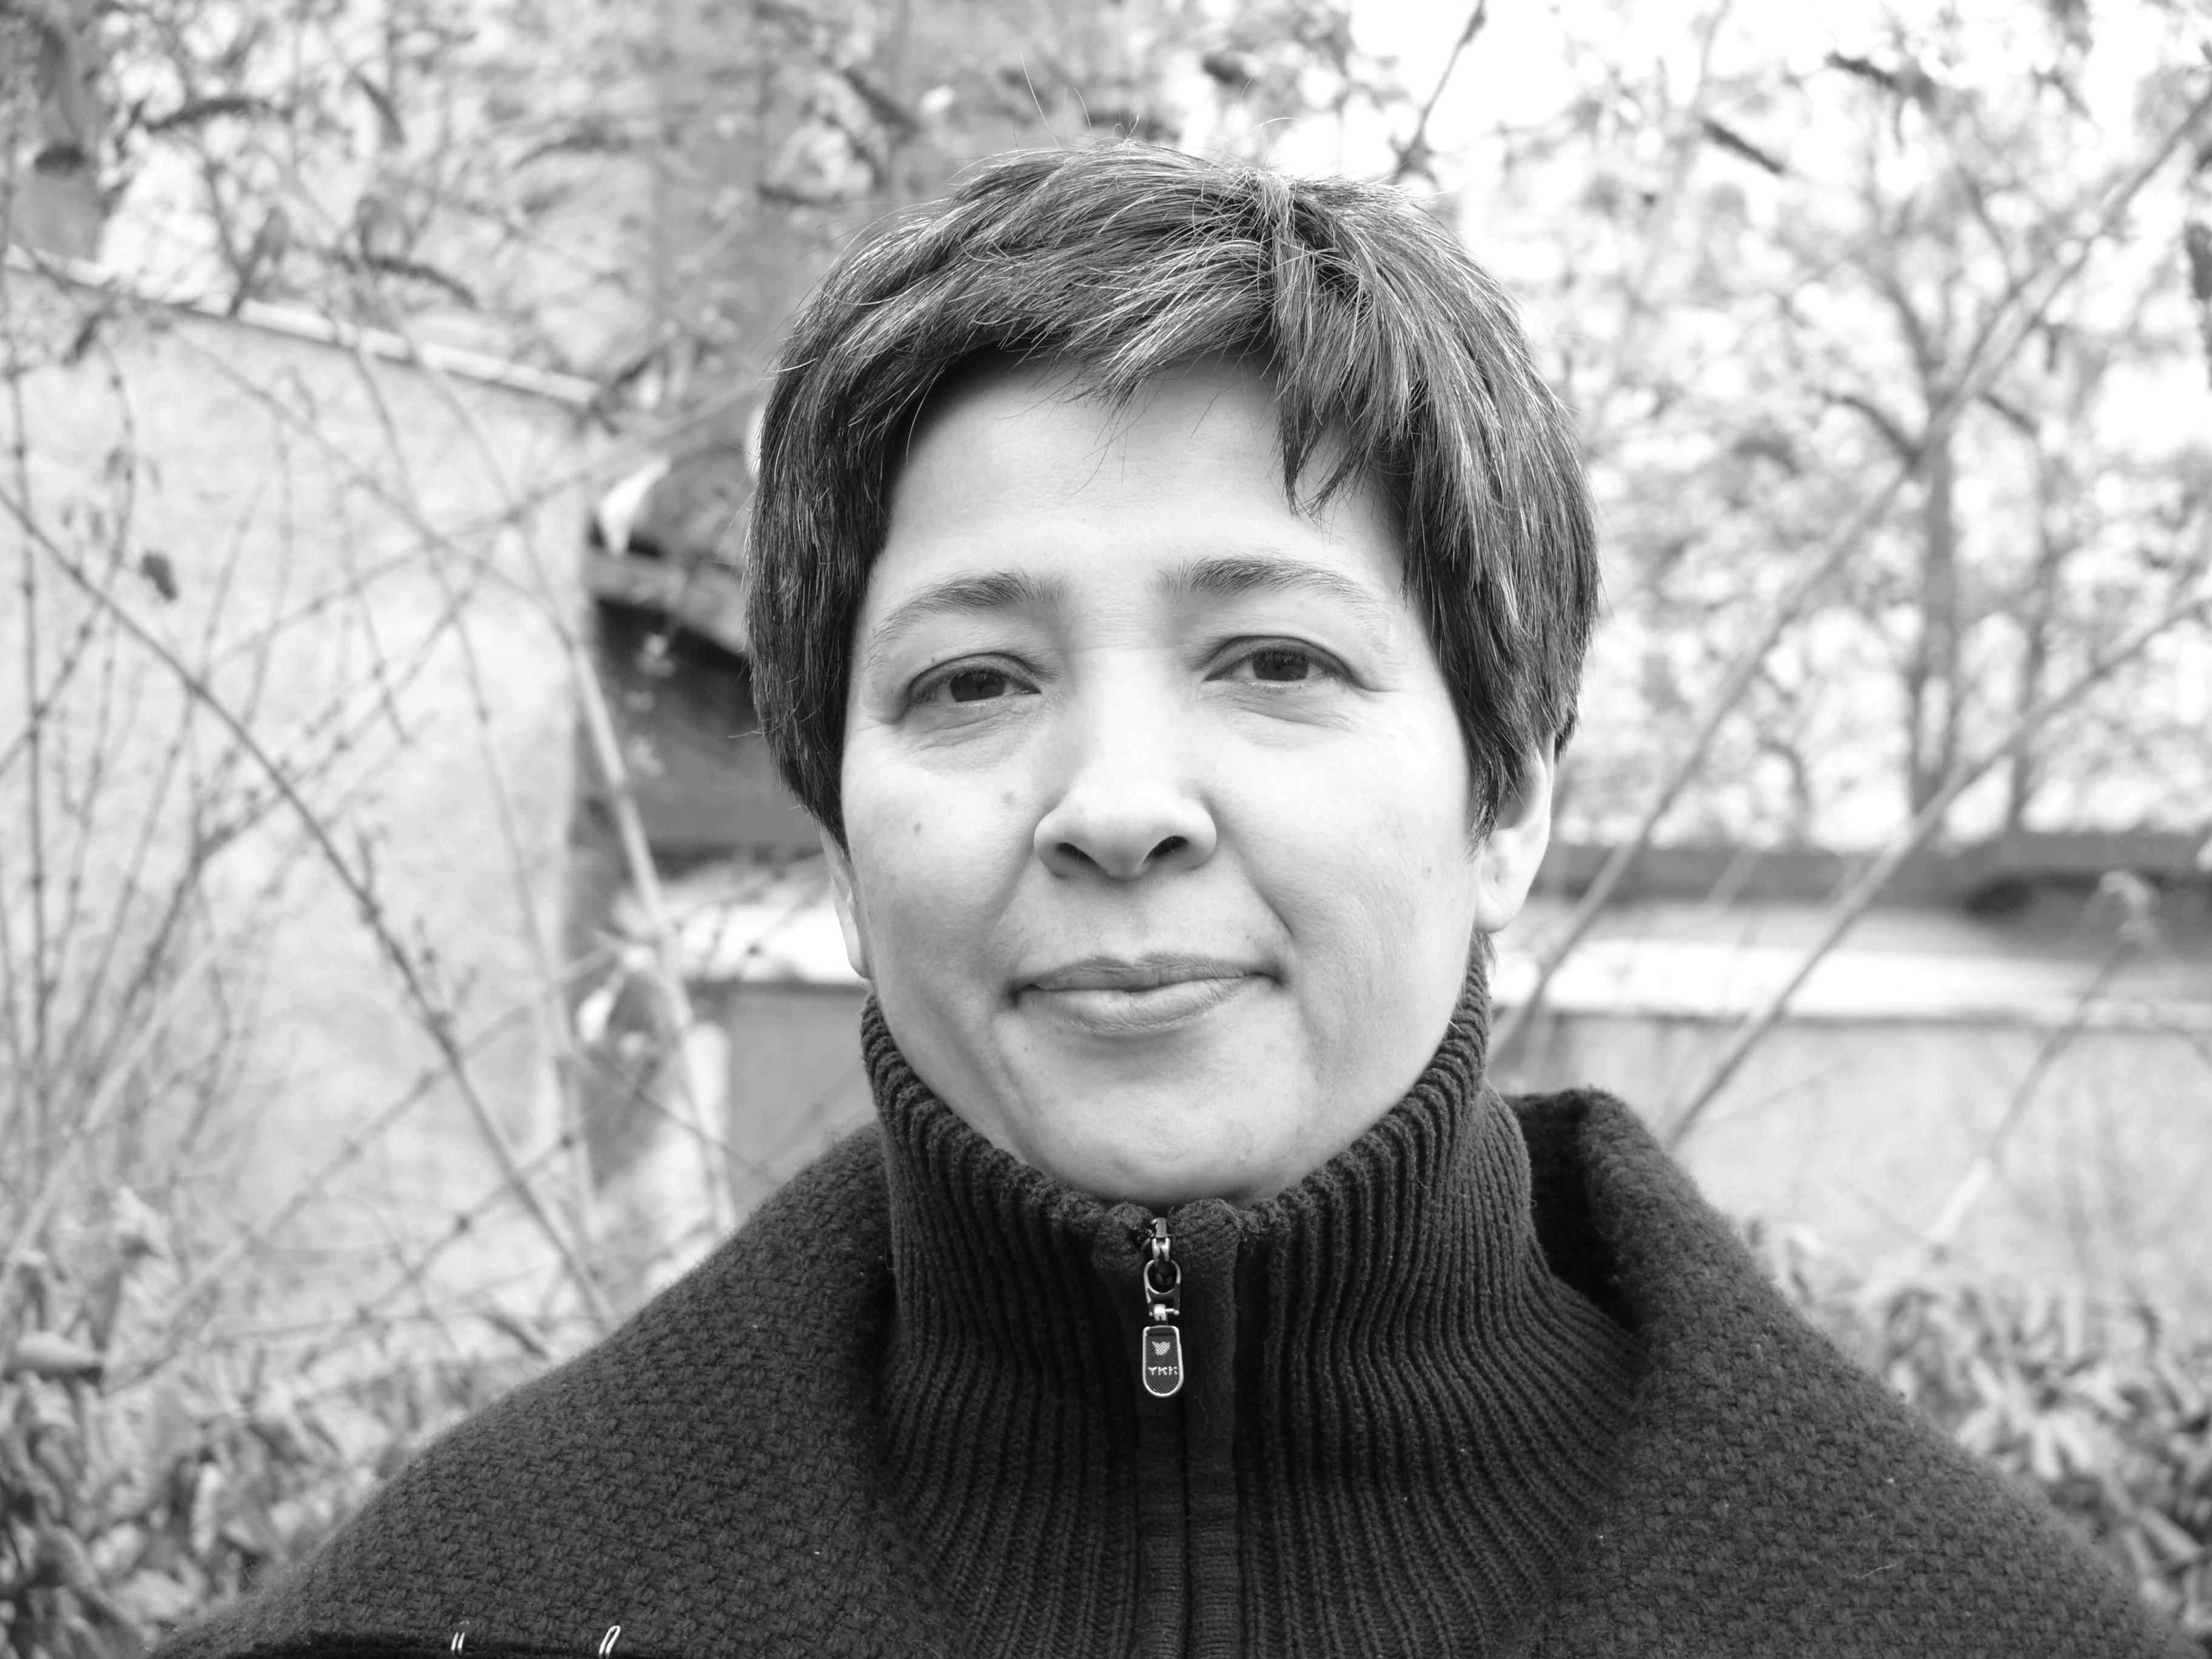 Fichier:Portrait - Seyran Ates.jpg — Wikipédia